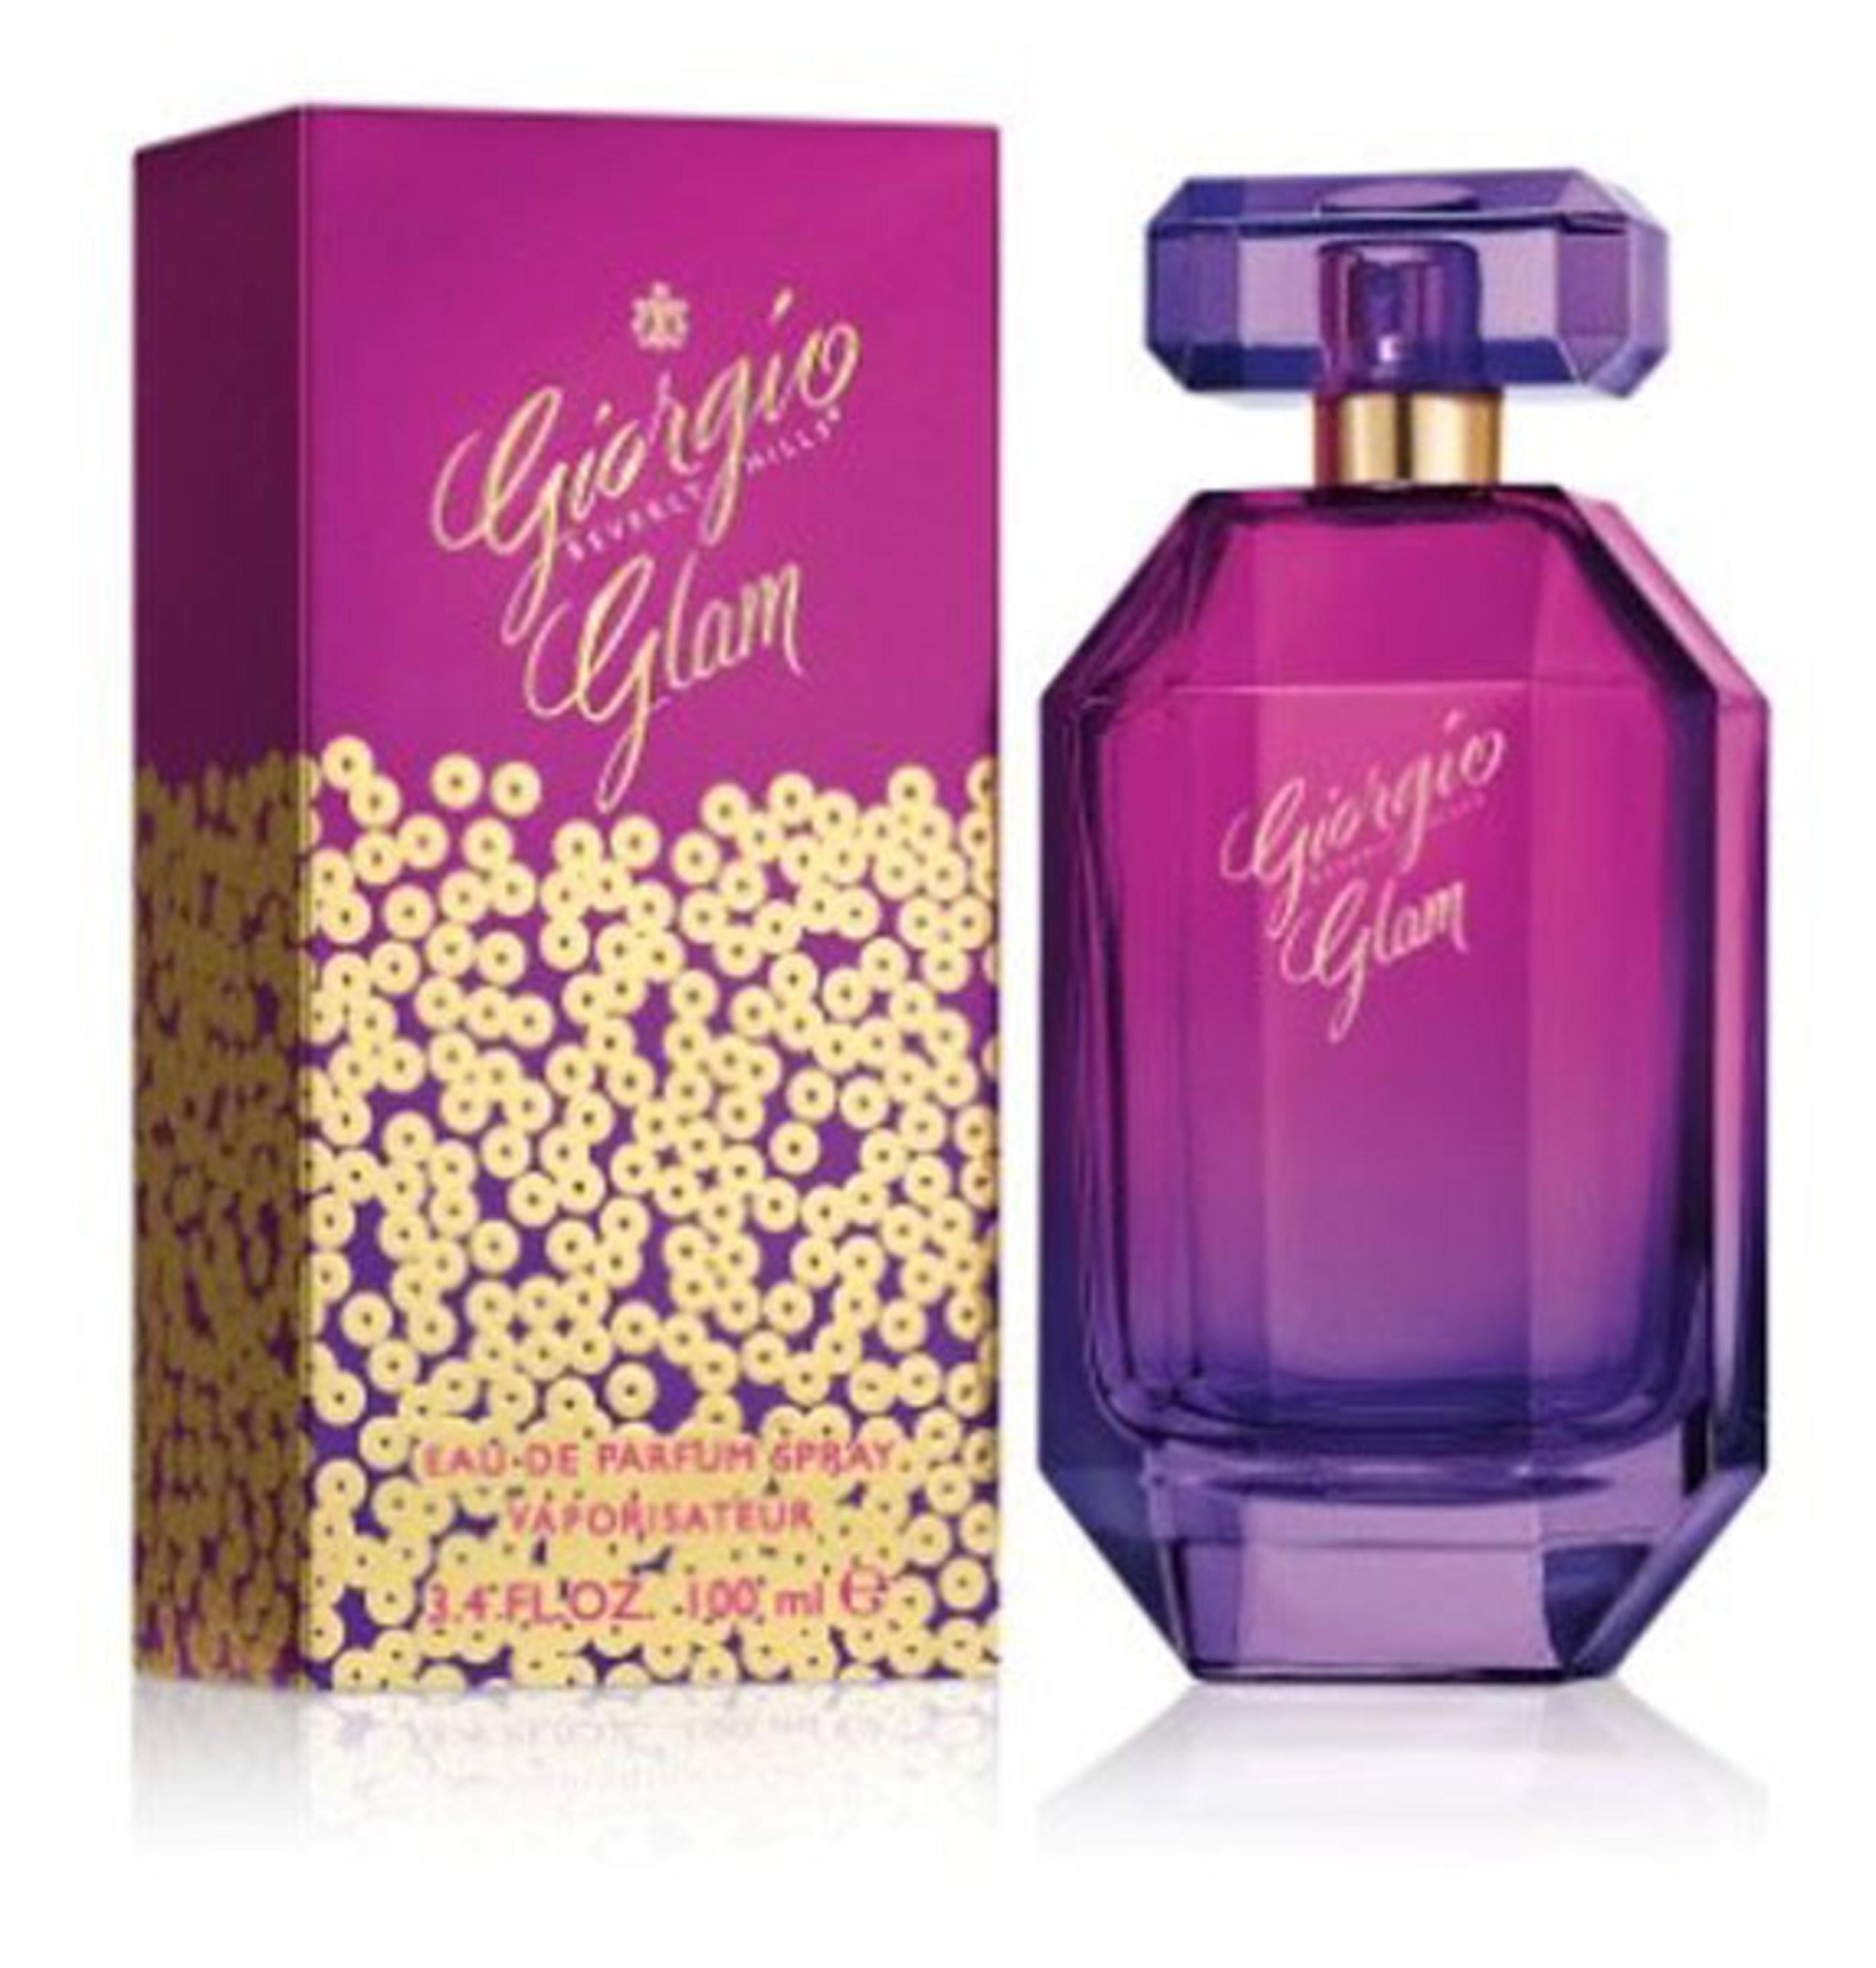 Giorgio Beverly Hills(R) Glam